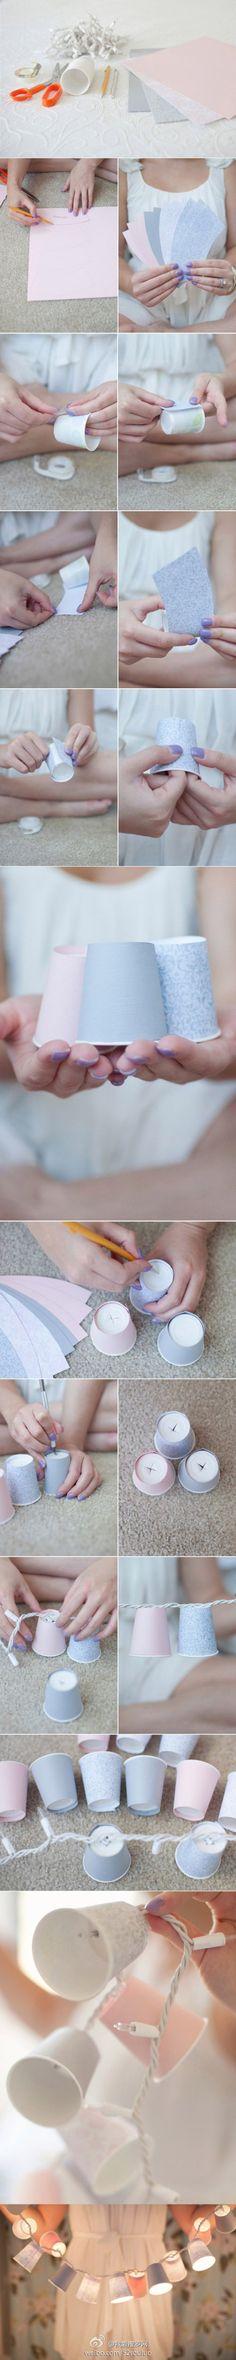 IDA Interior LifeStyle: DAY PIN DIY #9